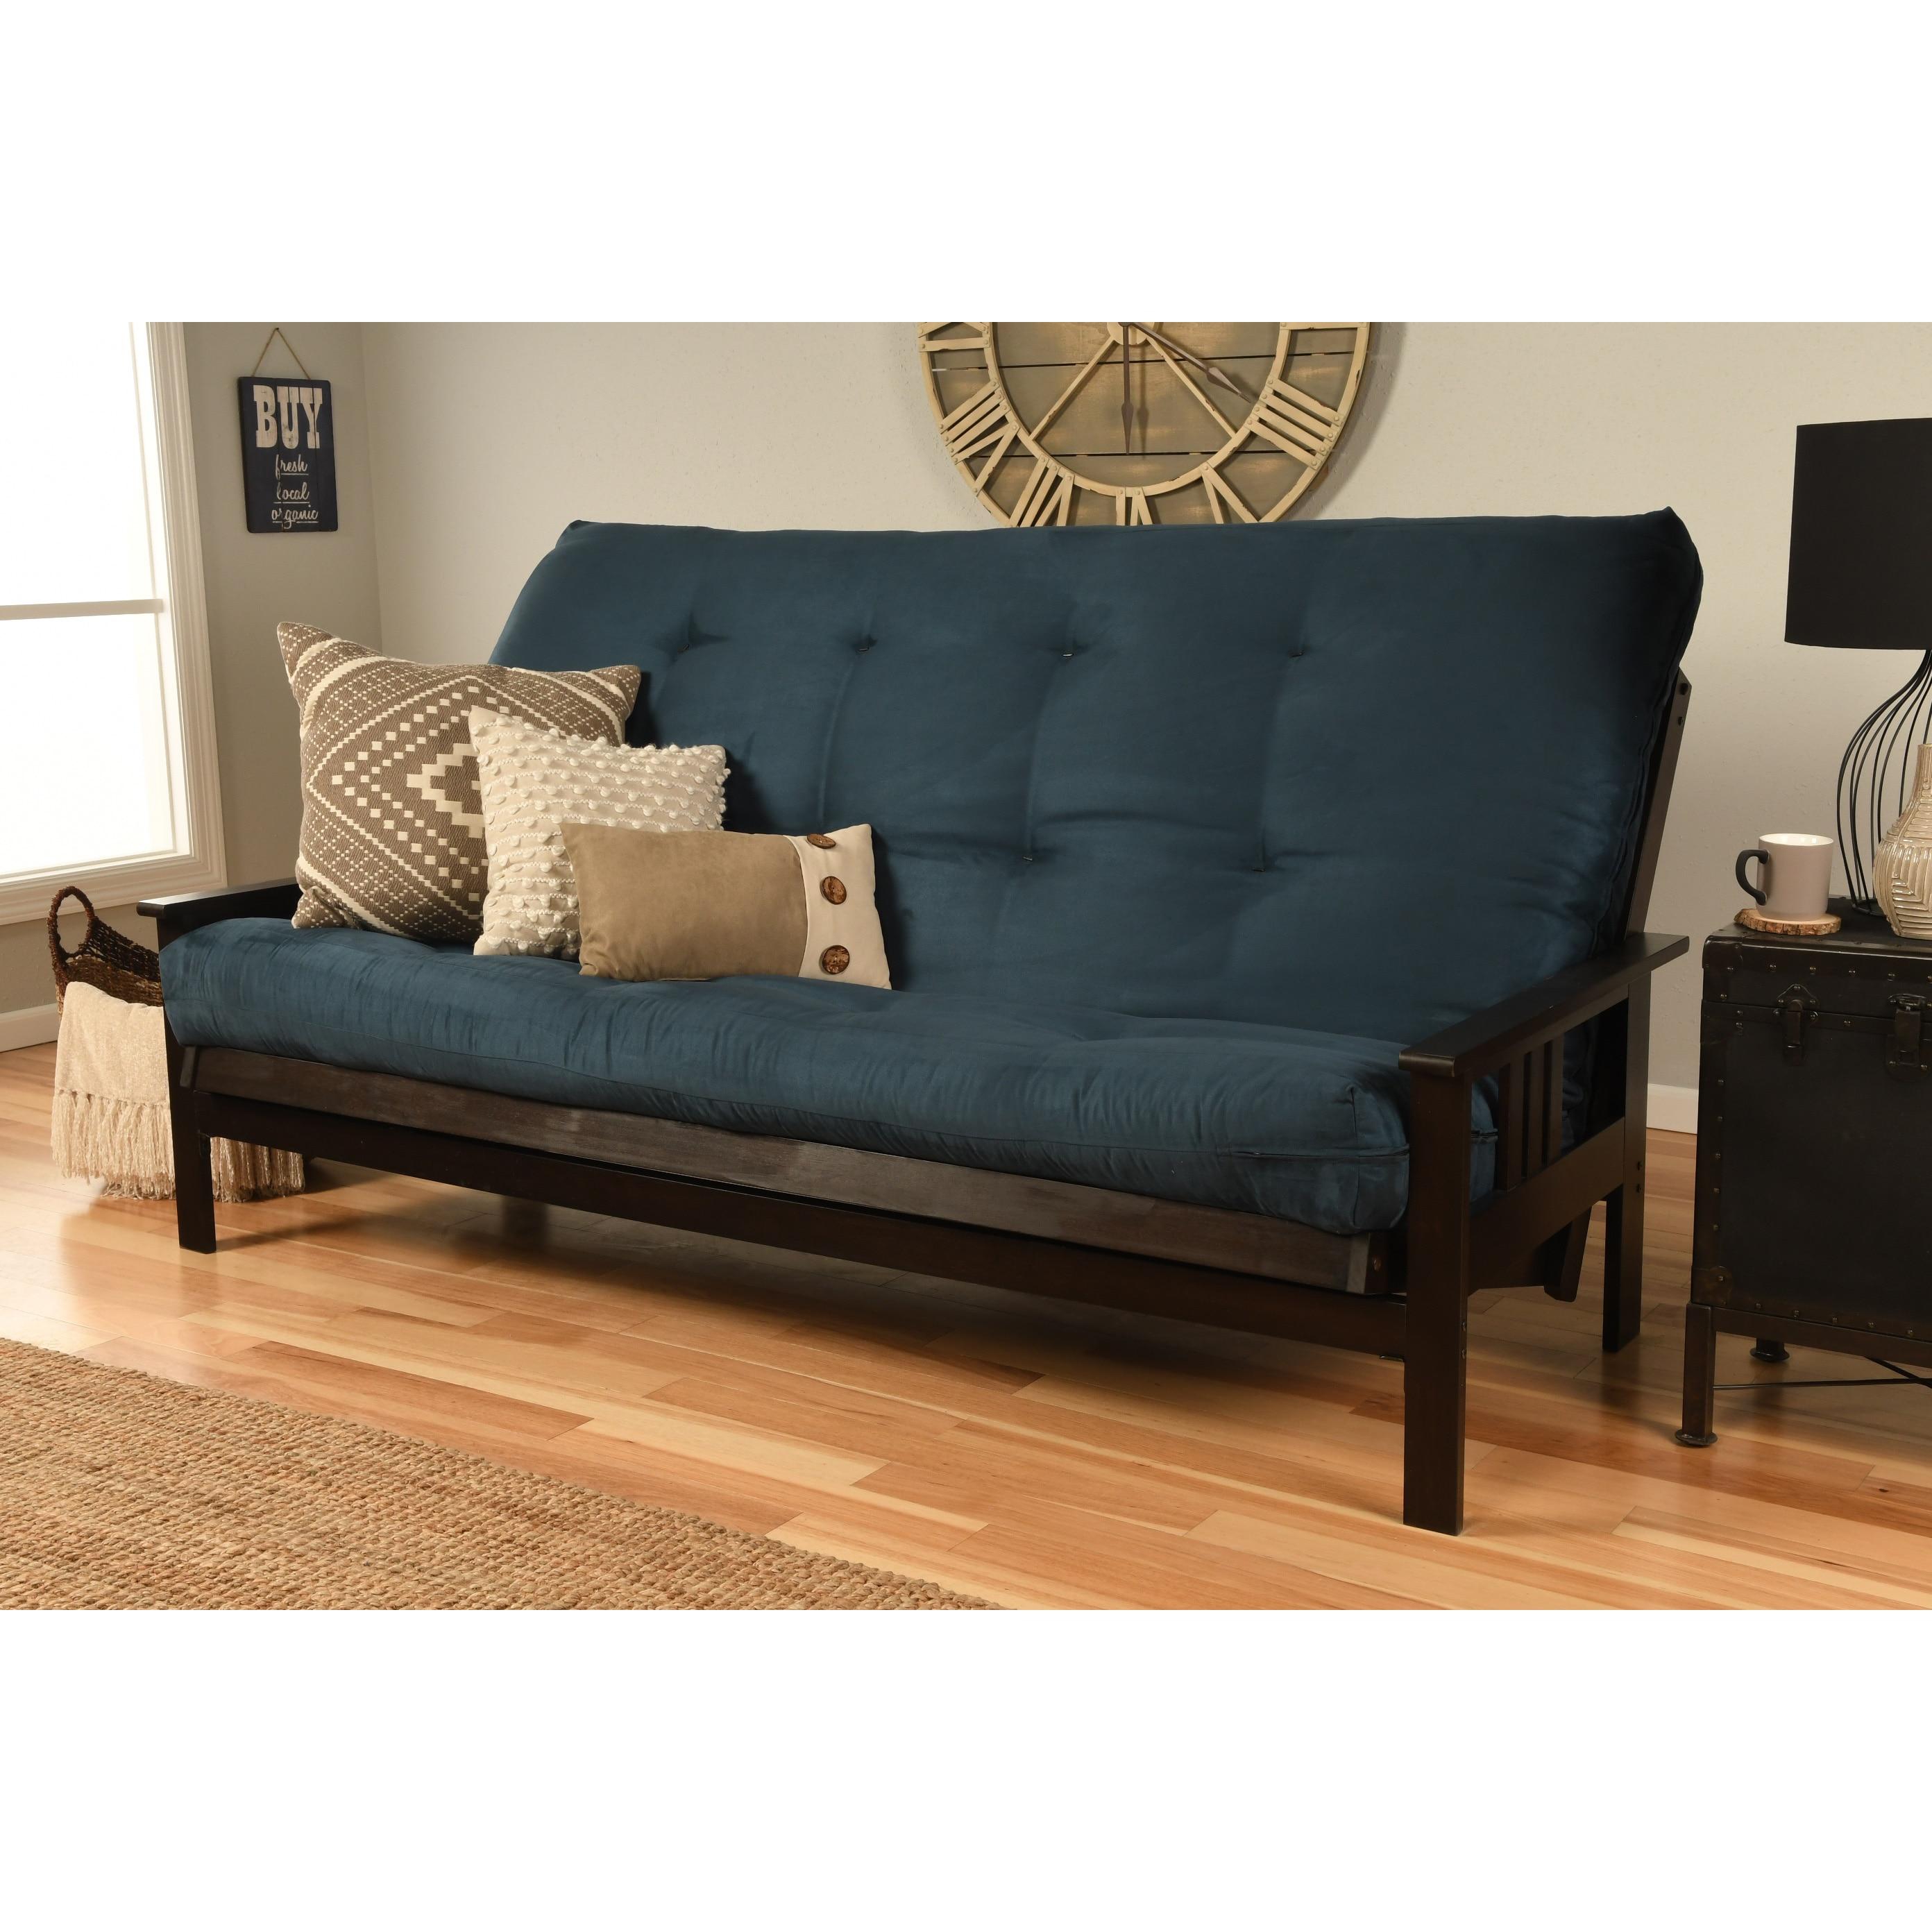 Shop Porch Den Desoto Hardwood Suede Queen Size Futon Sofa Bed